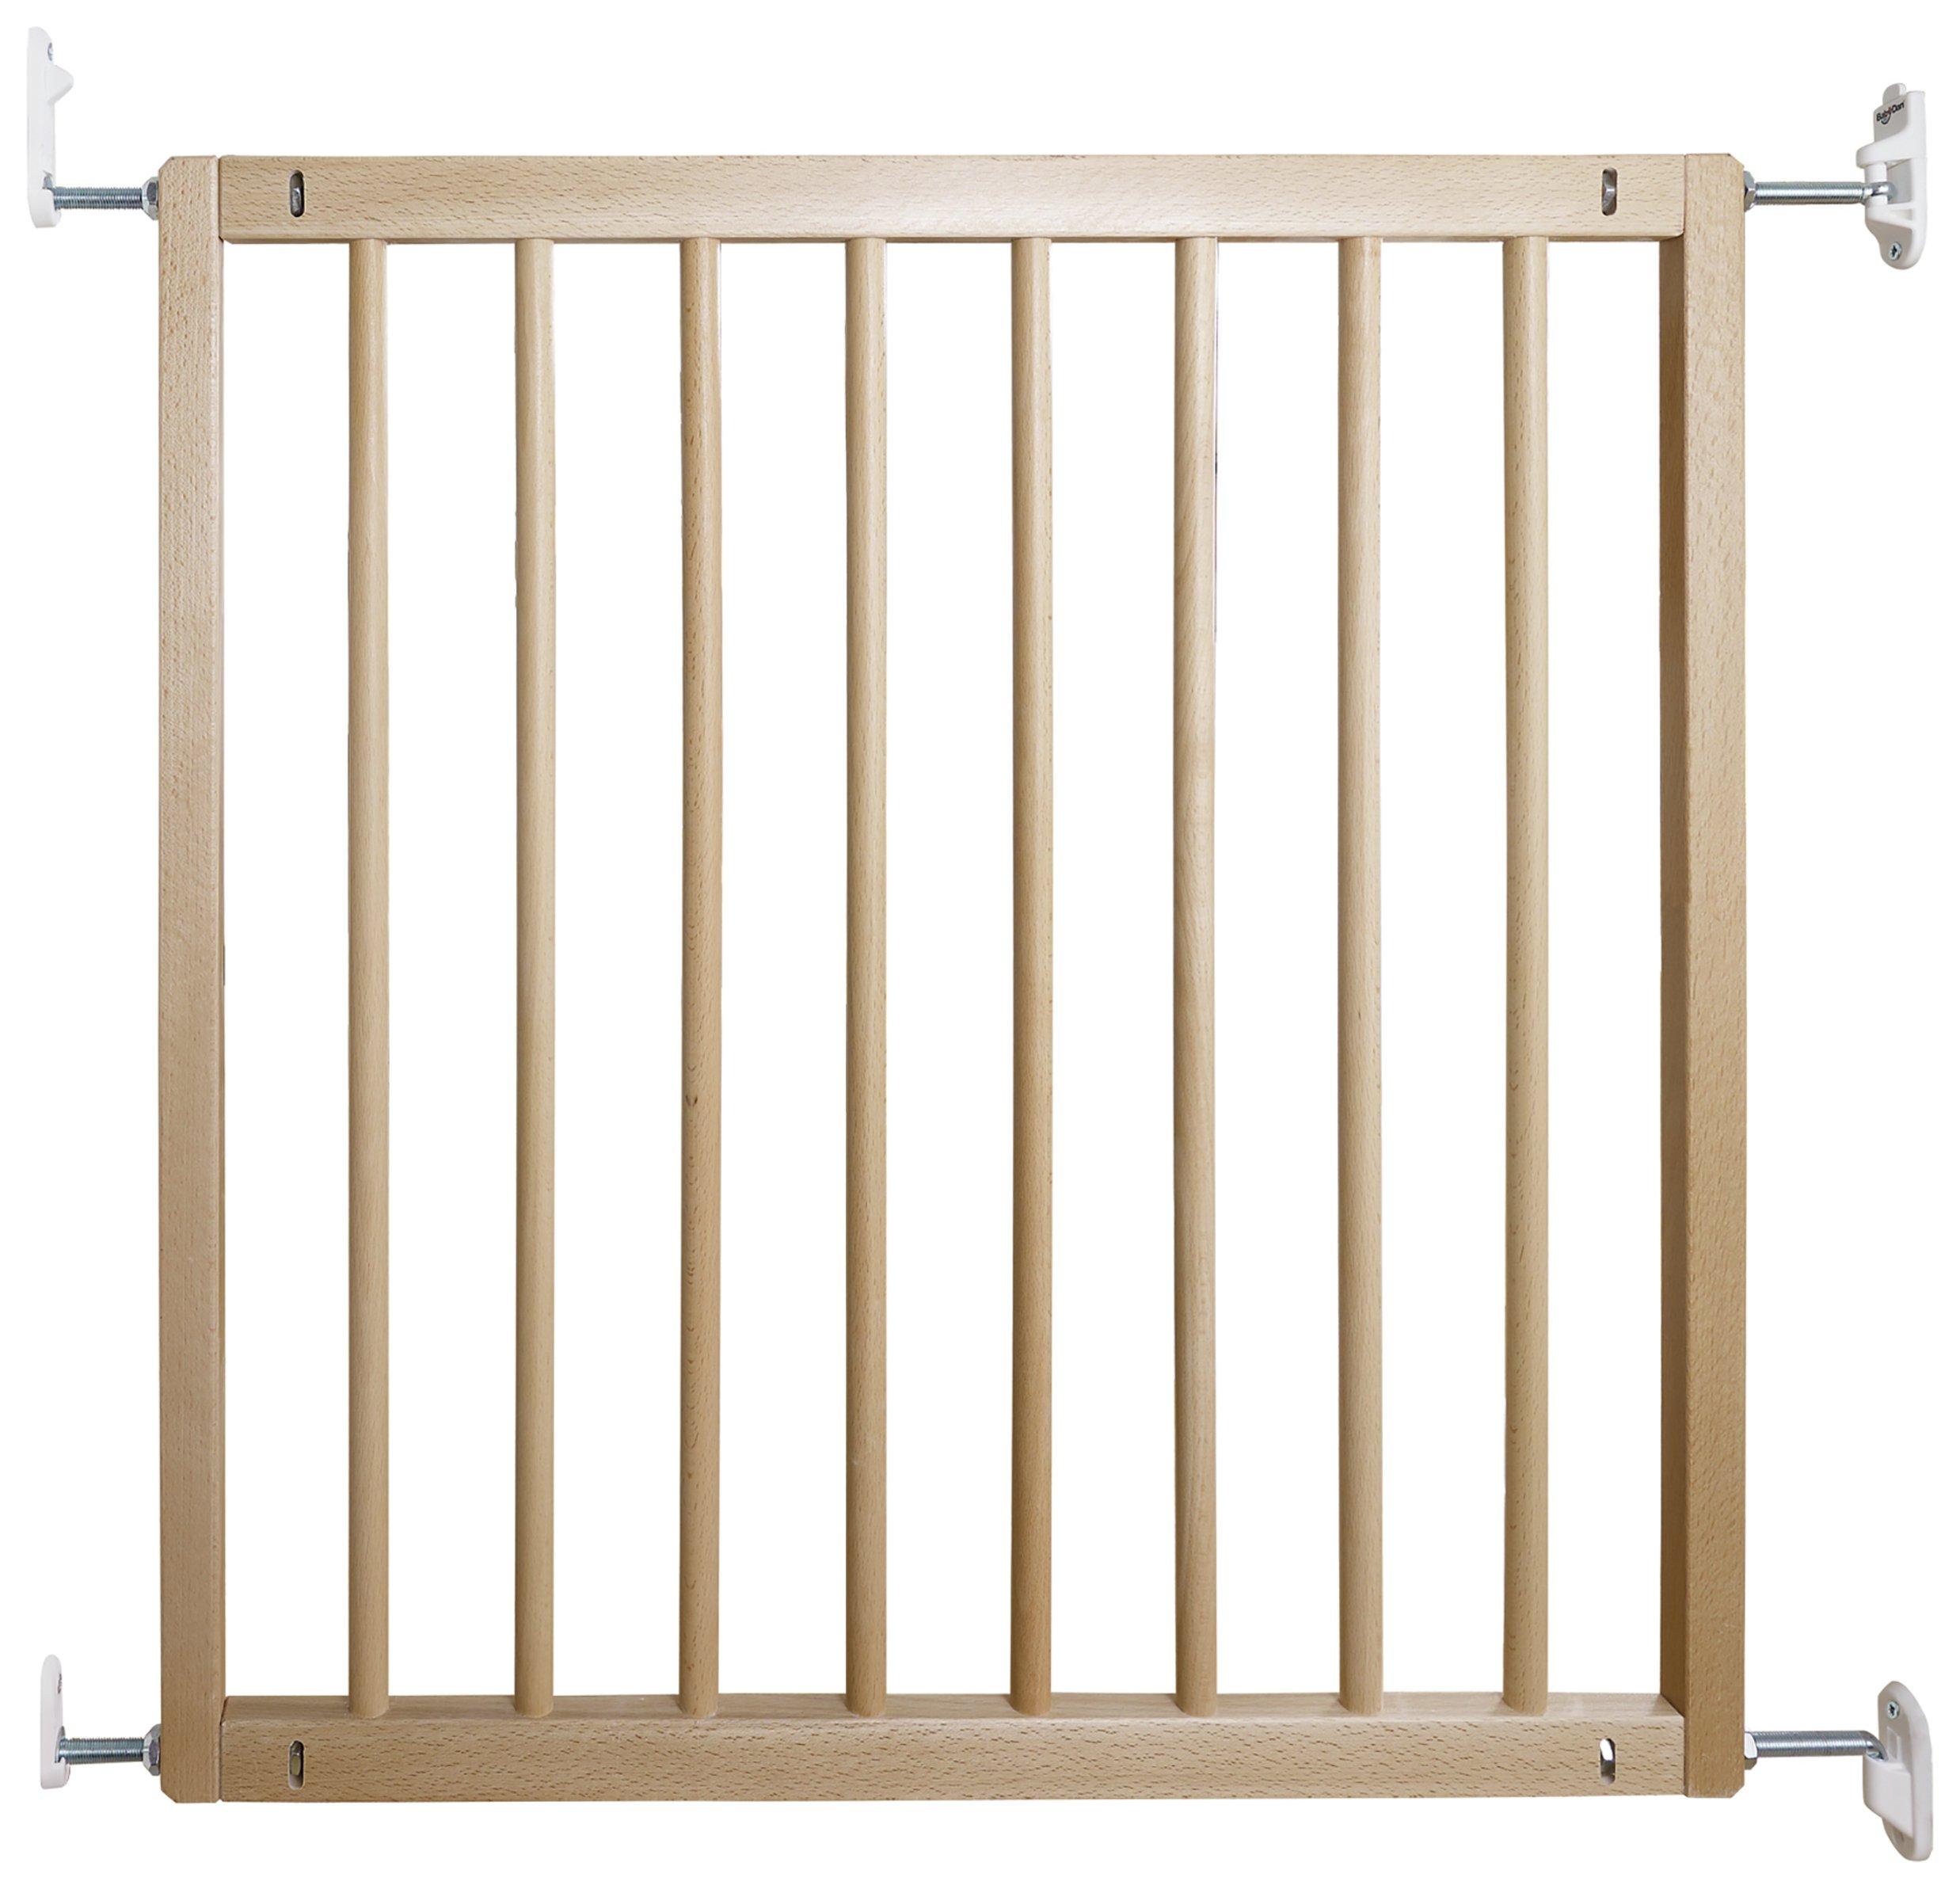 babydan narrow beechwood safety gate. Black Bedroom Furniture Sets. Home Design Ideas